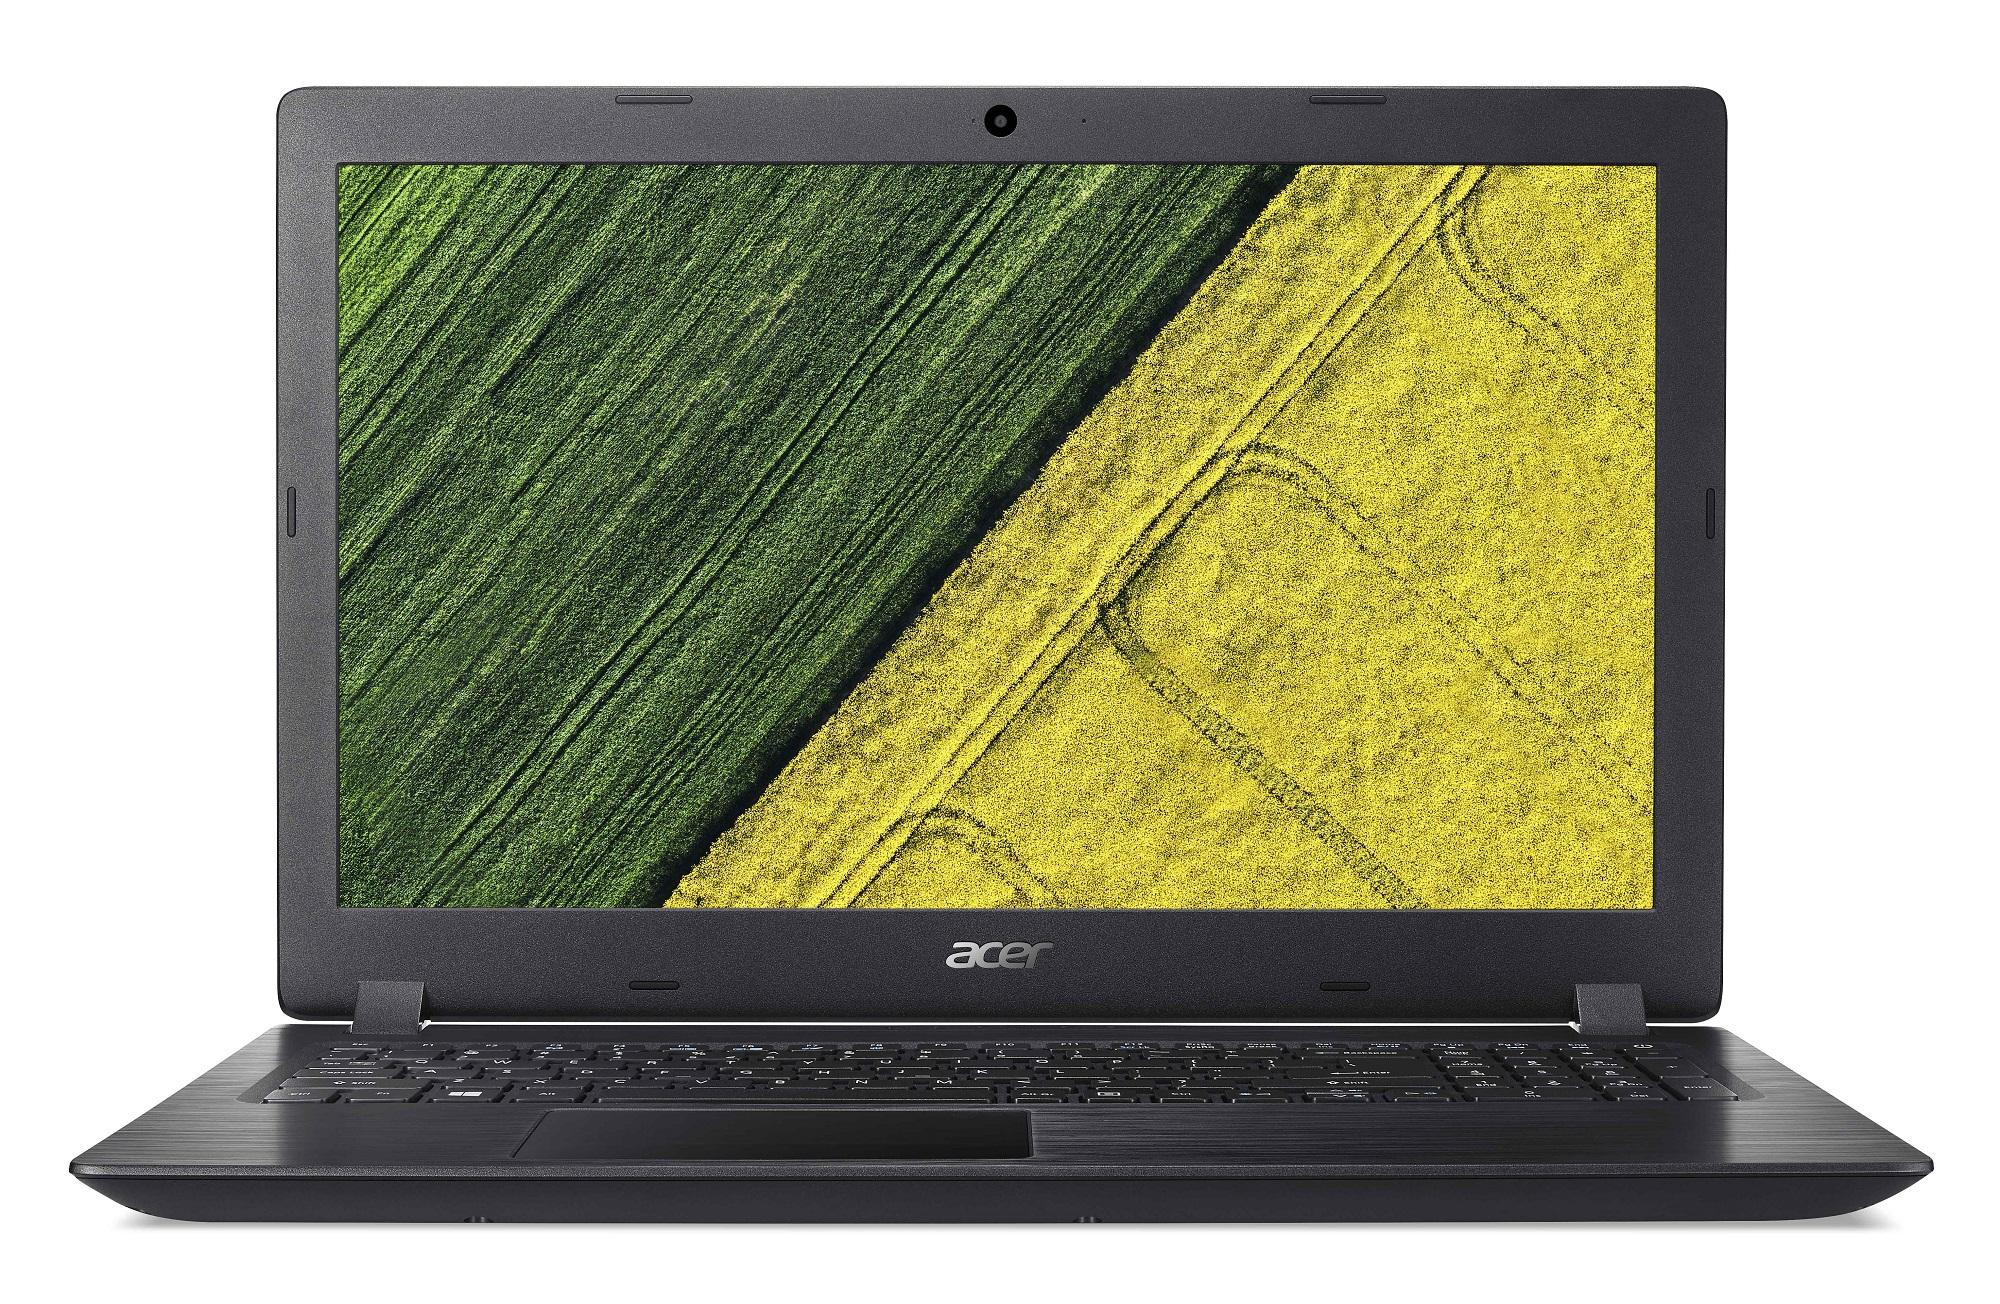 "Комплект Лаптоп Acer Aspire 1 A114-32-P84R/Windows 10S/14  +  Безжична мишка Omega OM-413 черен/сив диамант  +  Чанта за лаптоп Platinet 15,6"" York"